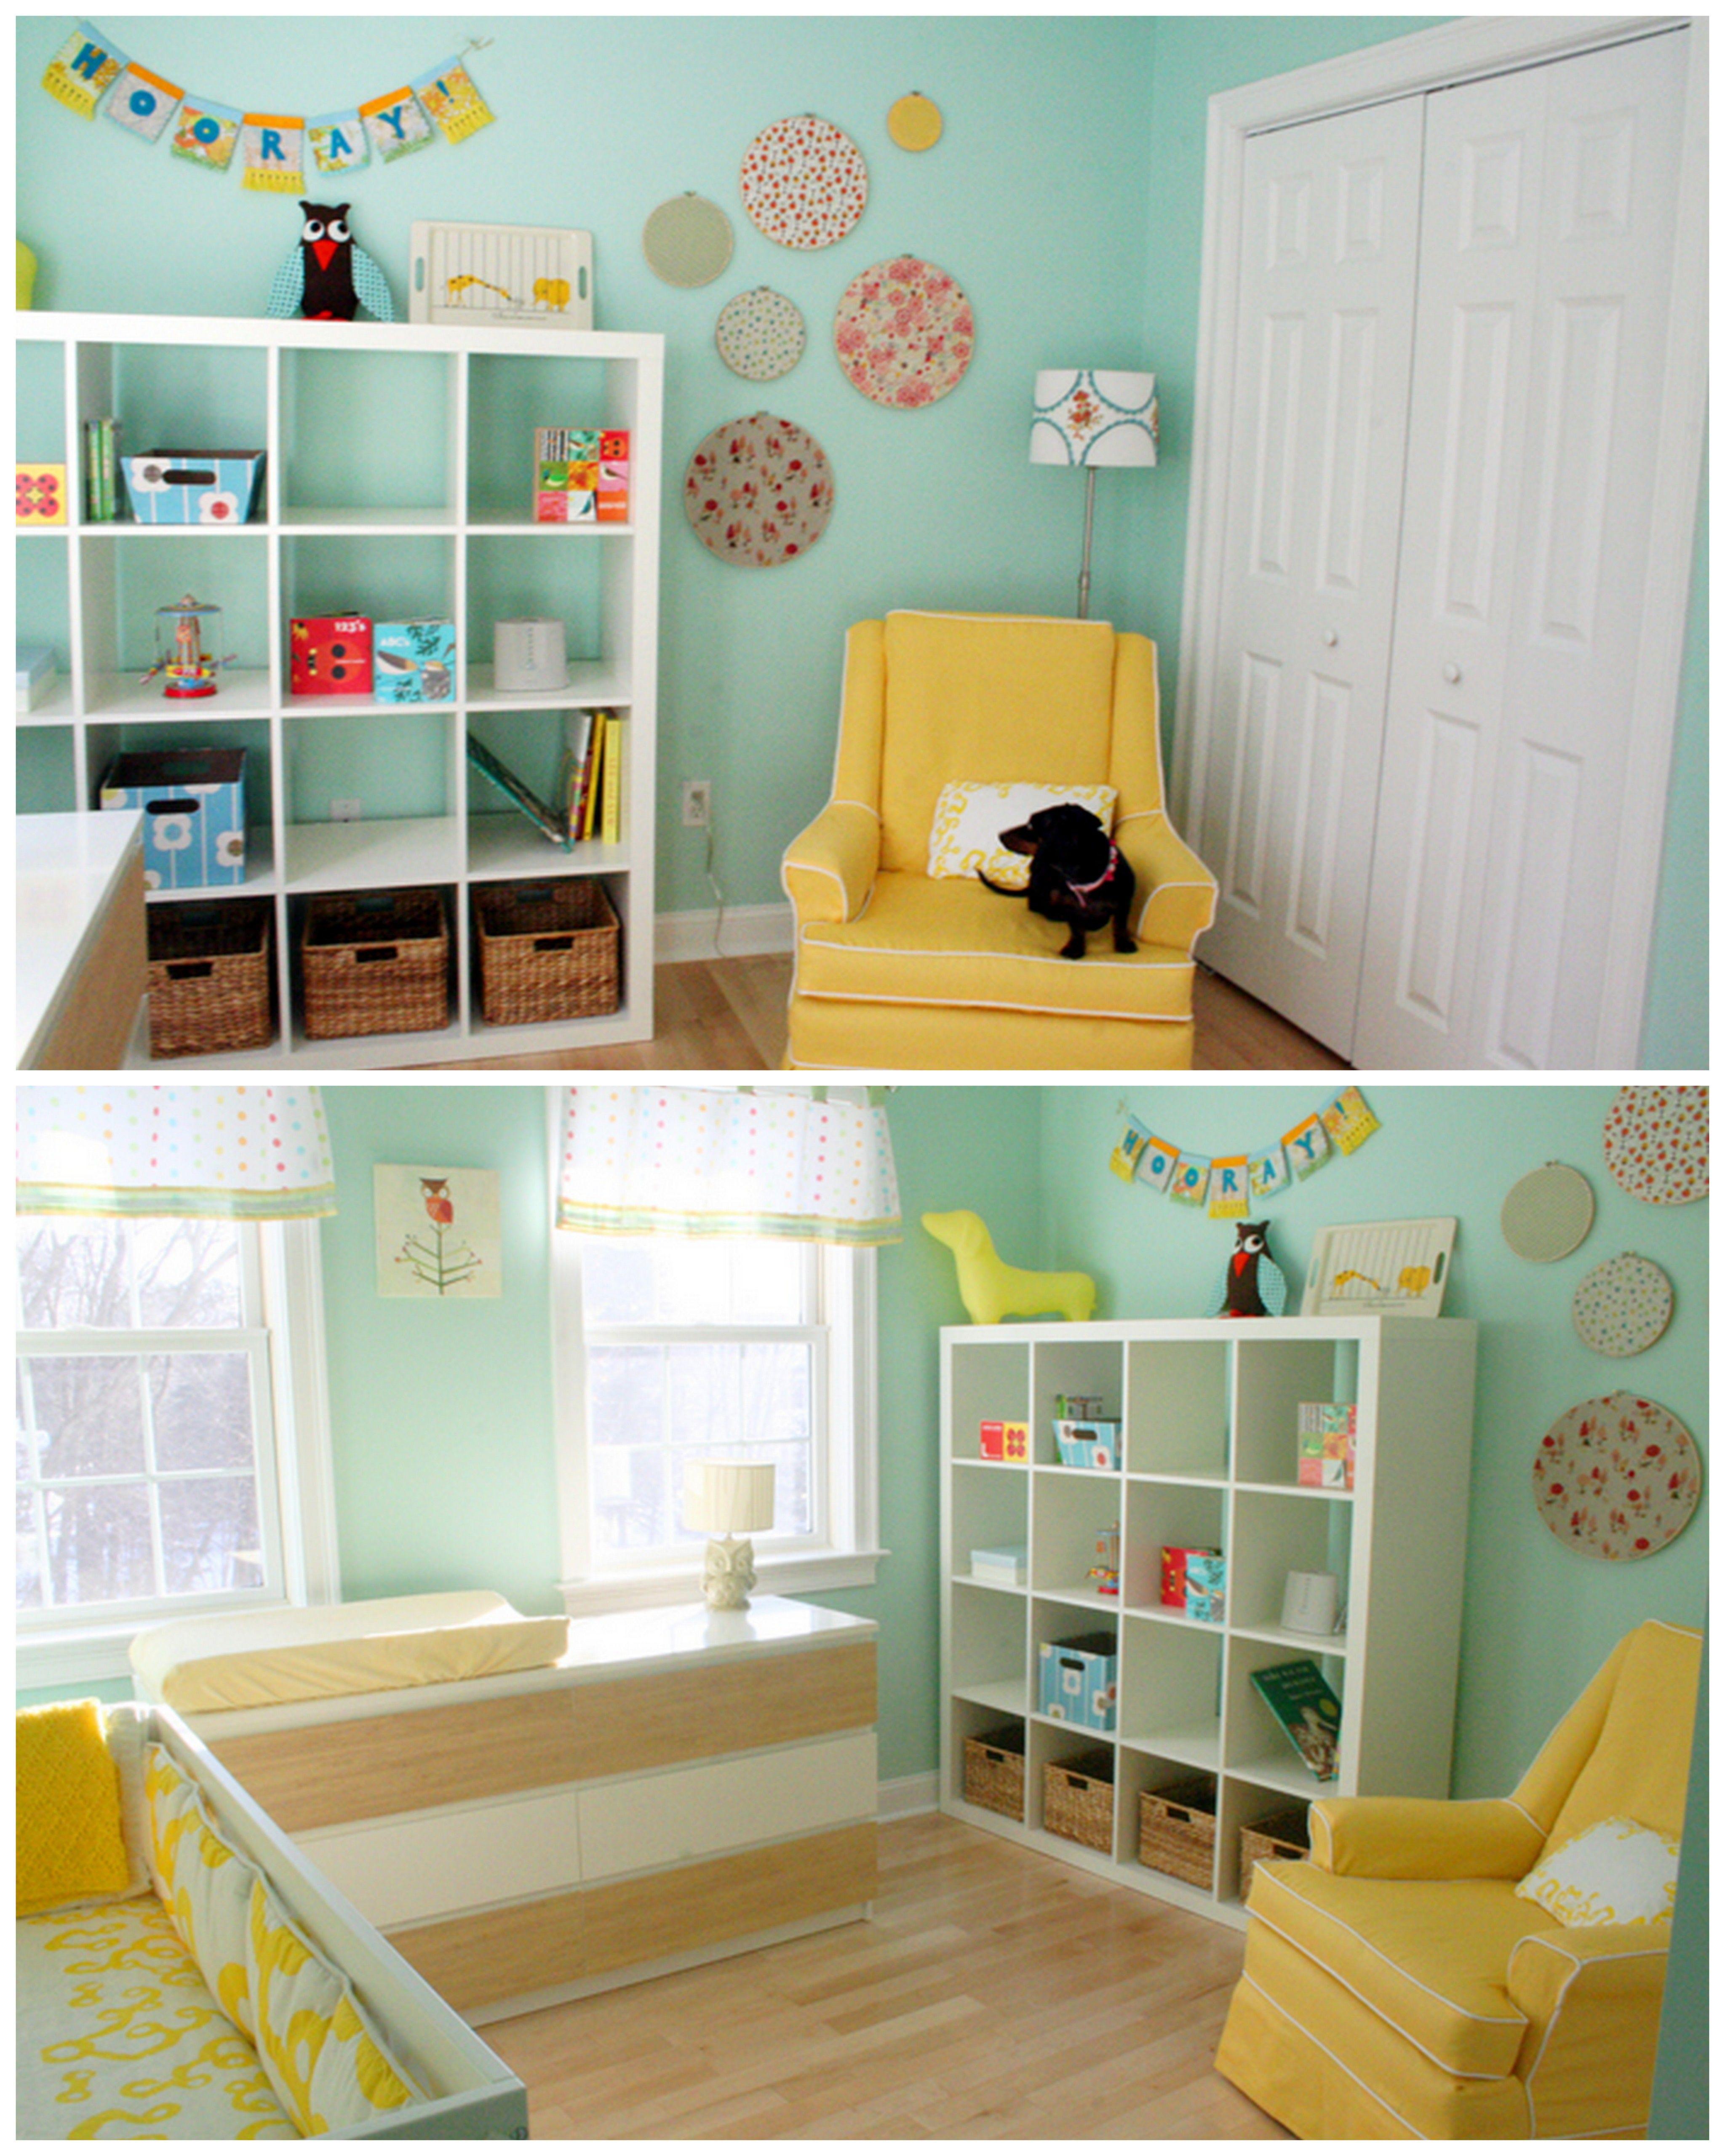 Mint & Mustard Nursery Love The Color Scheme And Weenie